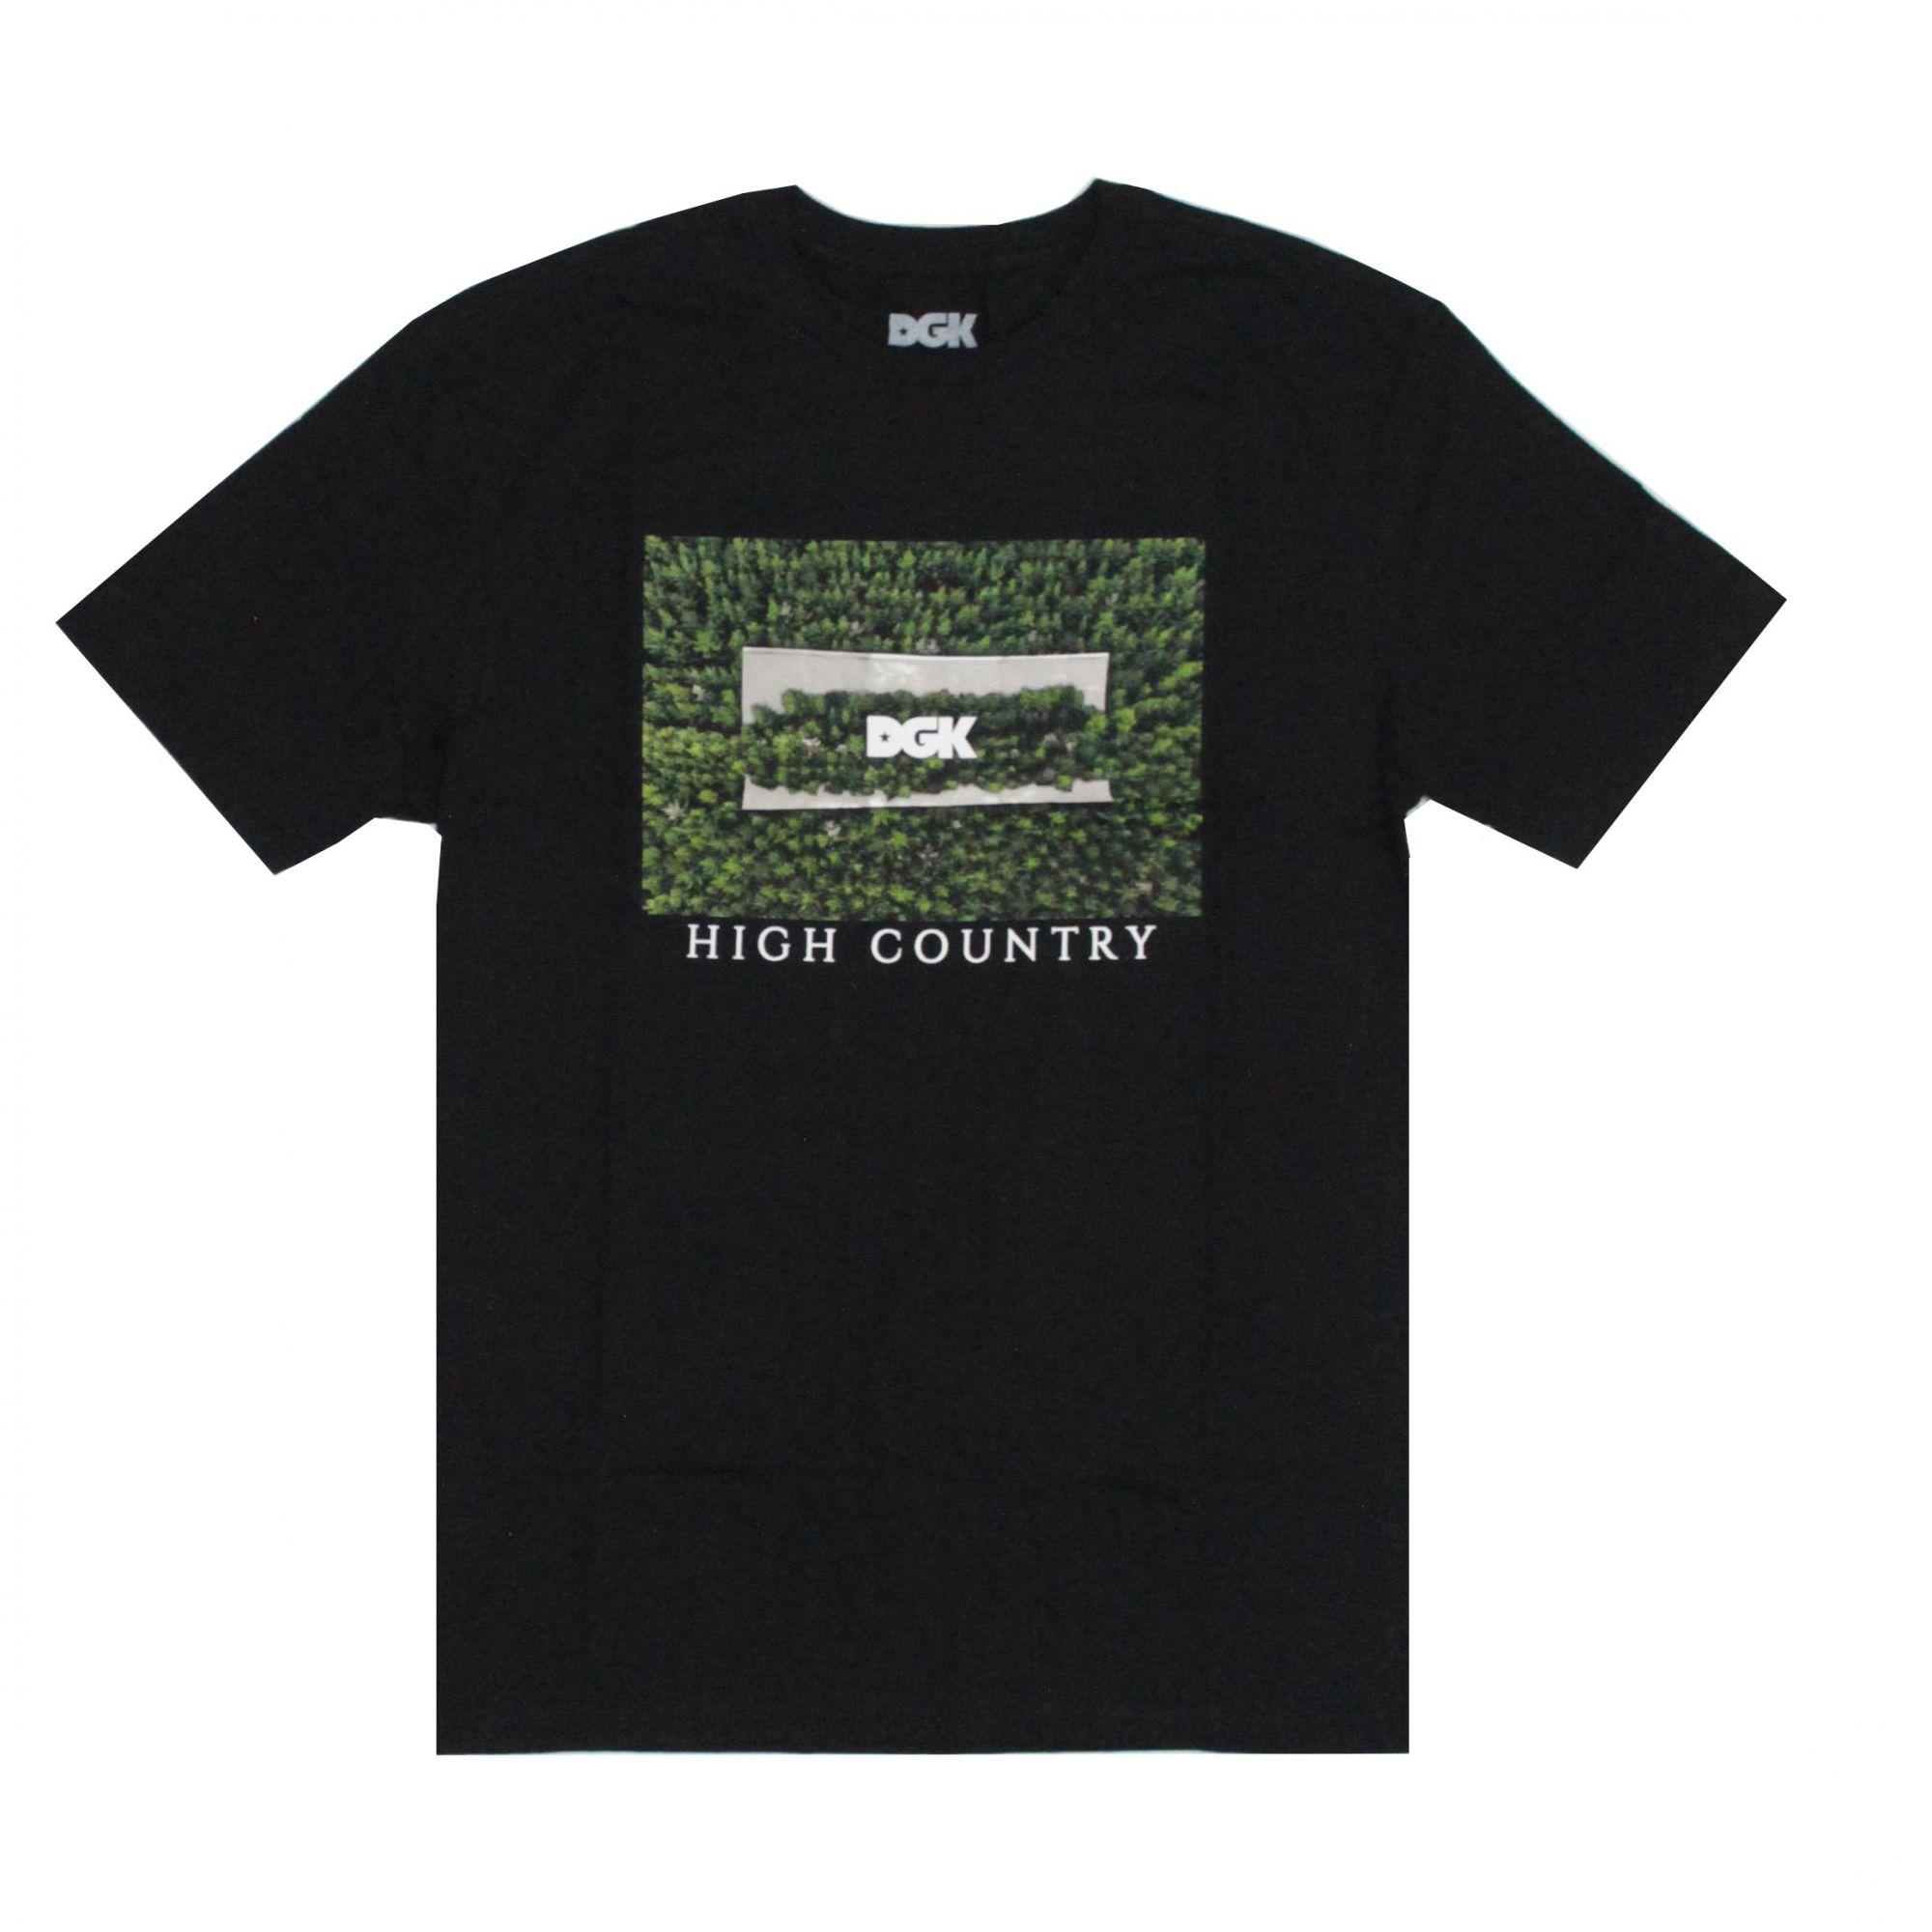 Camiseta DGK High Country Preto